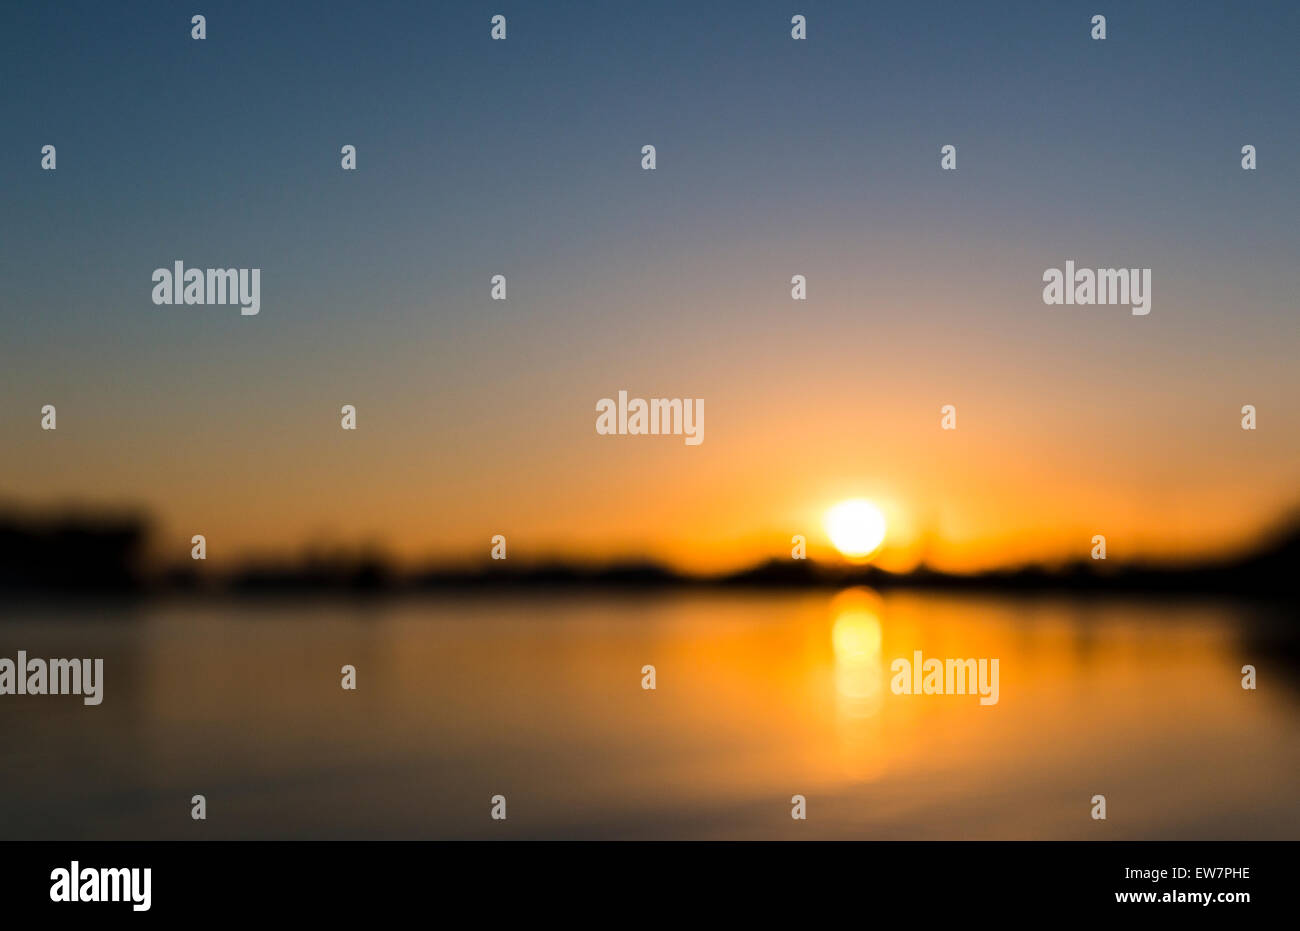 Orange Sunset Over River Daugava Riga Europe Blurred Background Nobody No People Night Evening Dusk - Stock Image